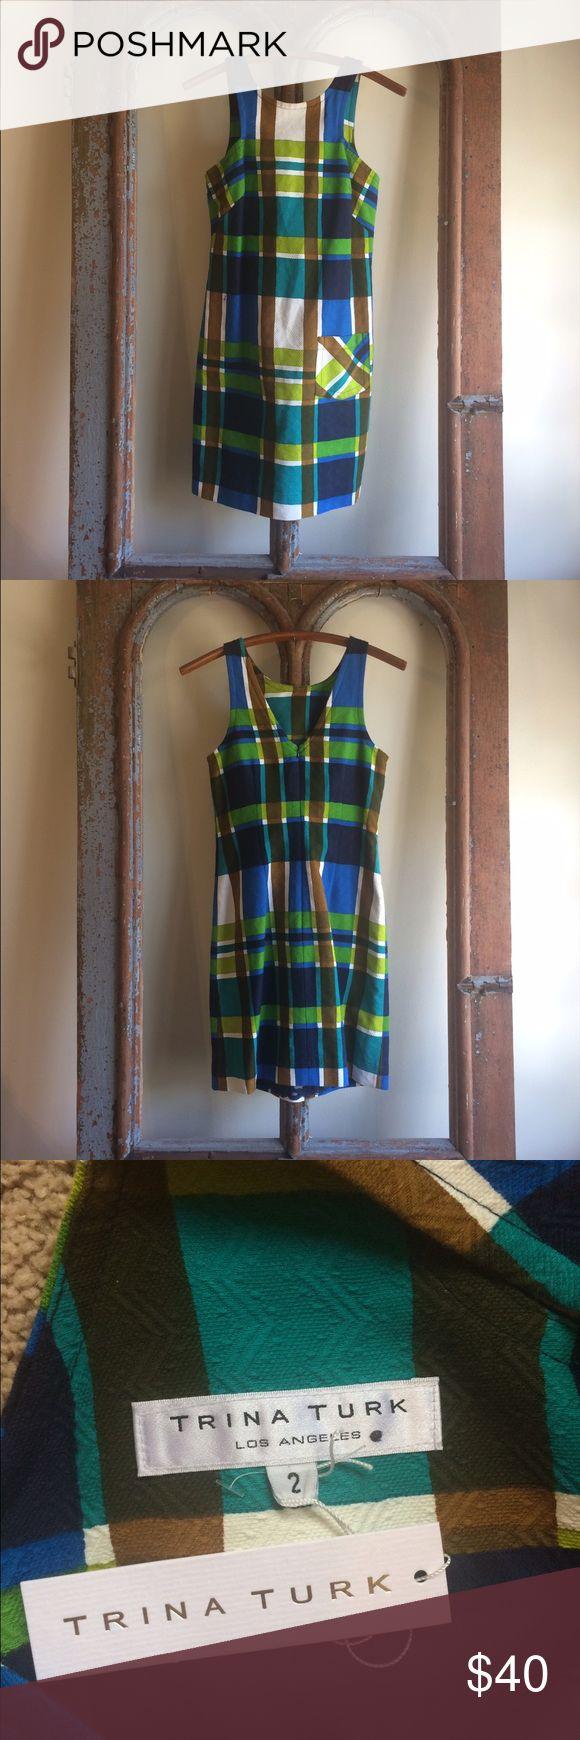 Trina Turk, Size 2 Dress Blue and green plaid mini Trina Turk dress in a size 2 Trina Turk Dresses Mini